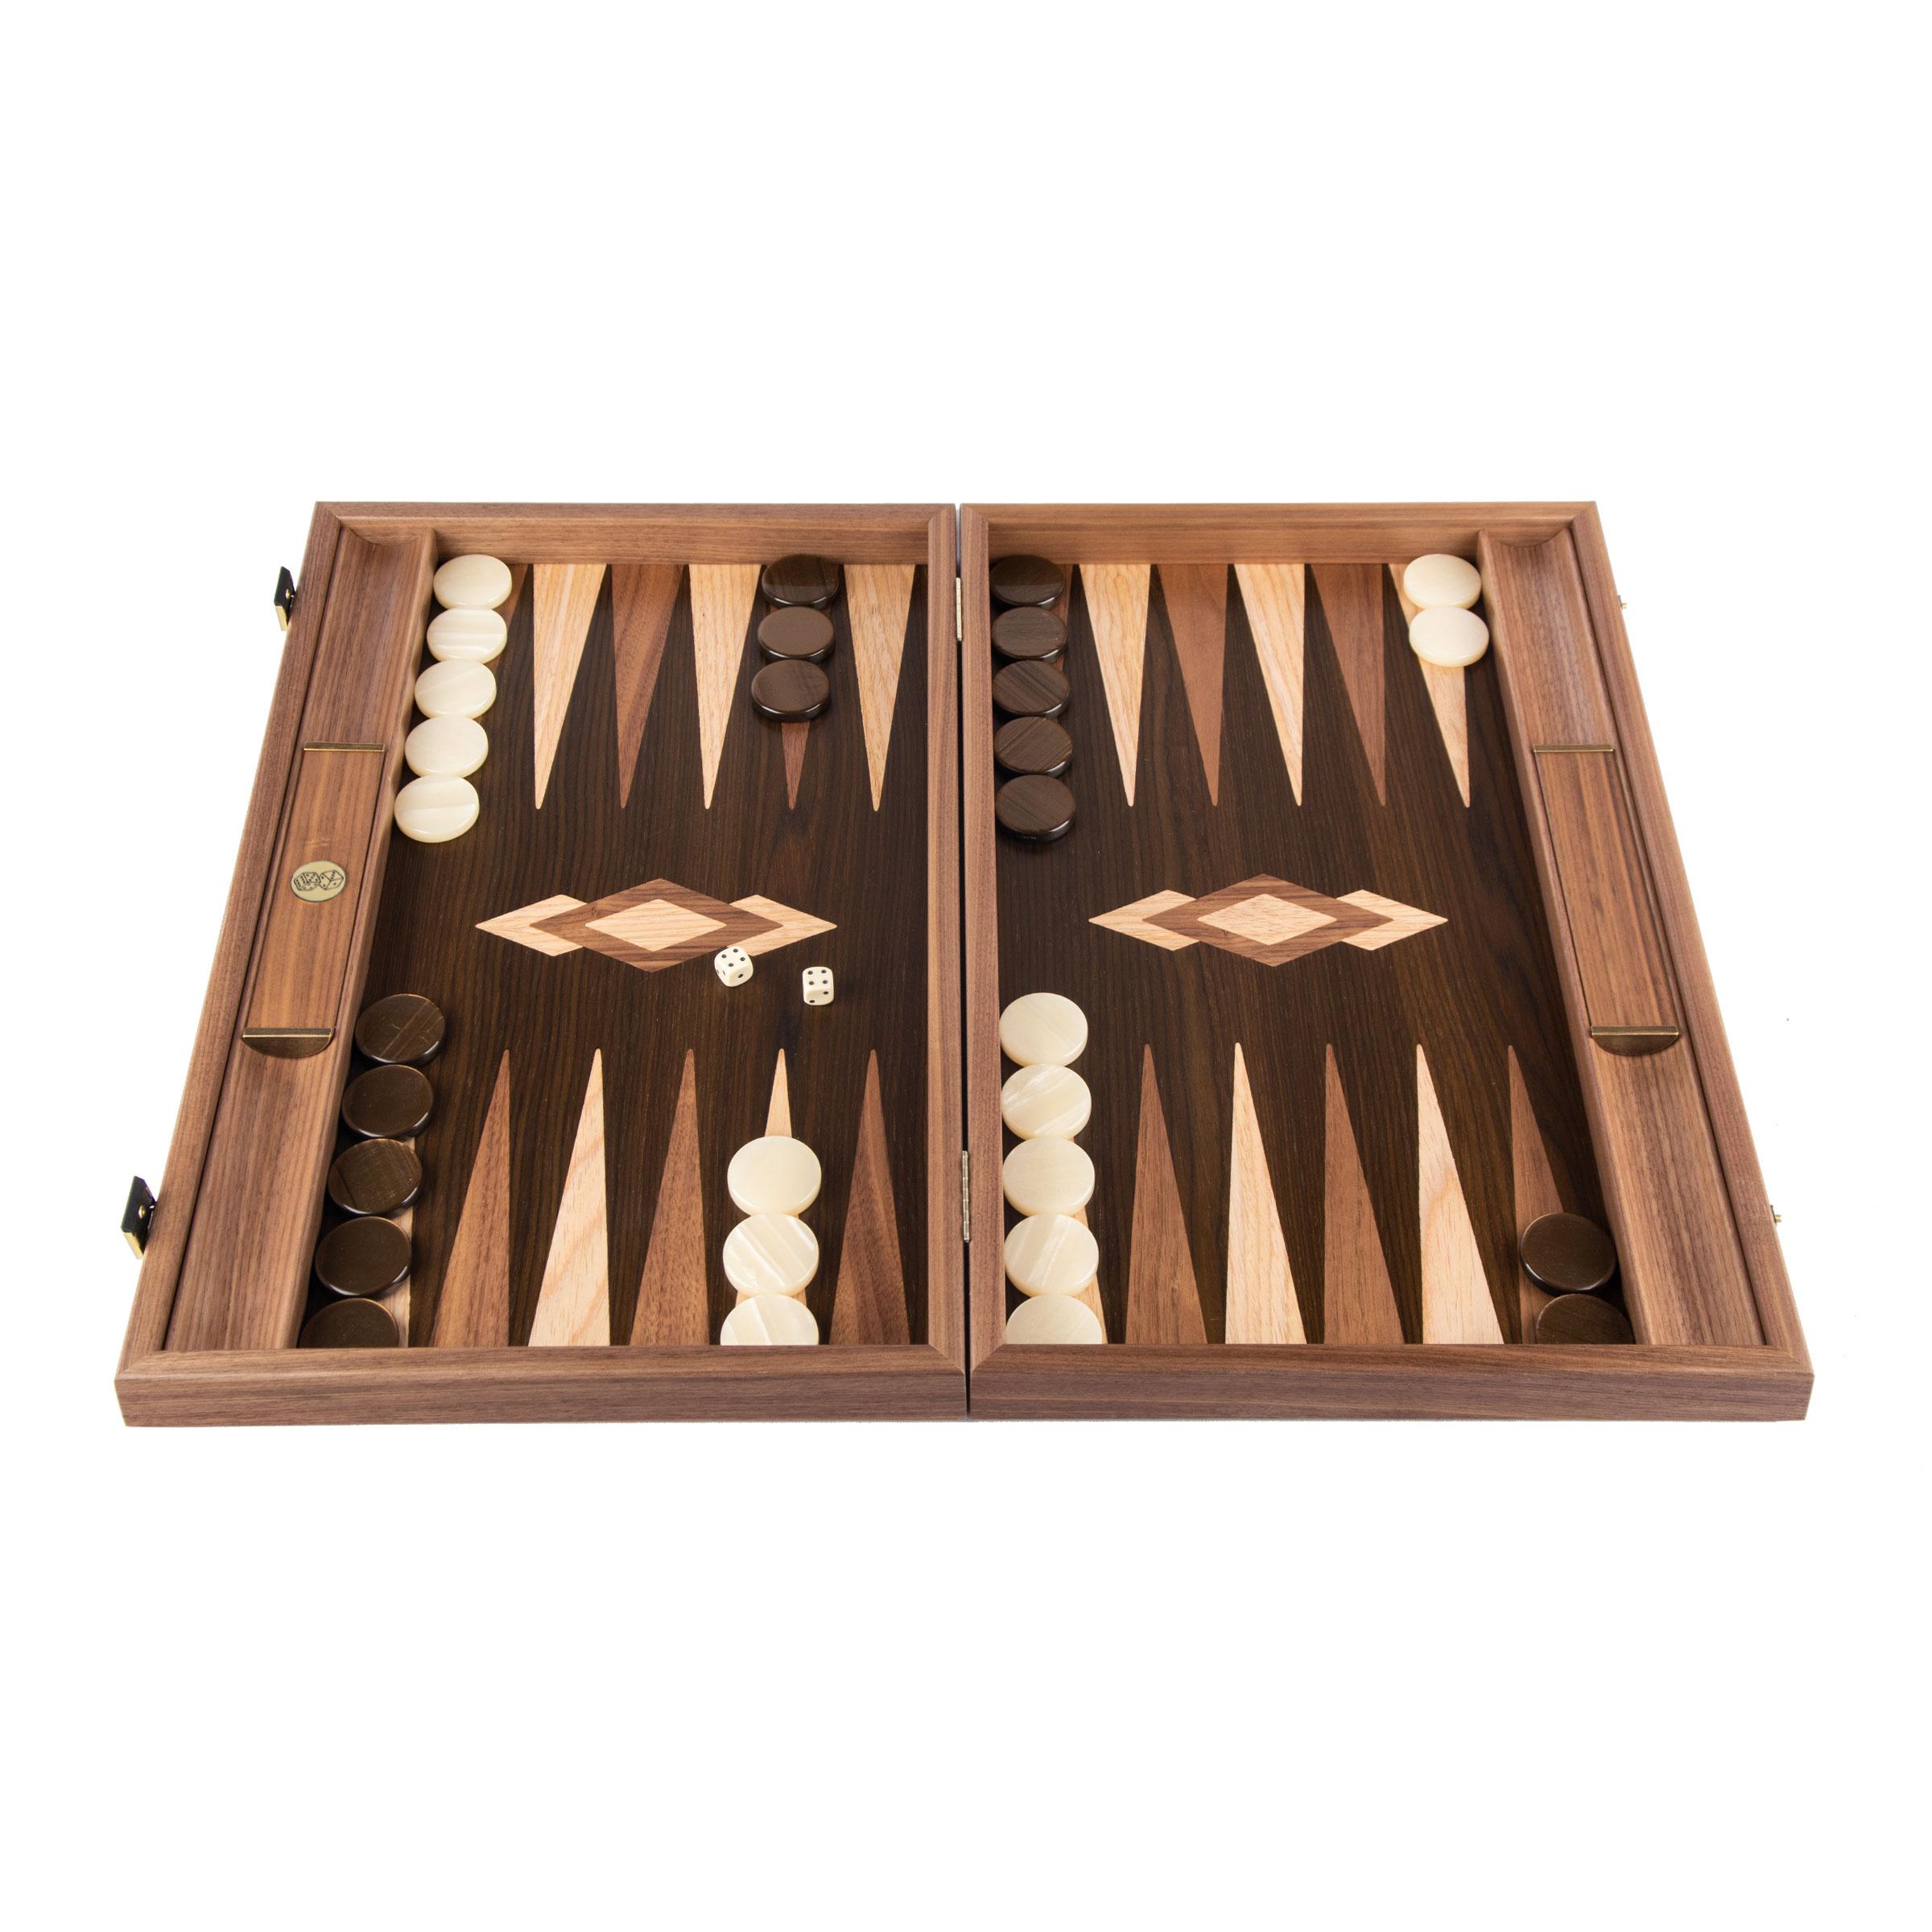 Walnut tree truck backgammon set 19 inches